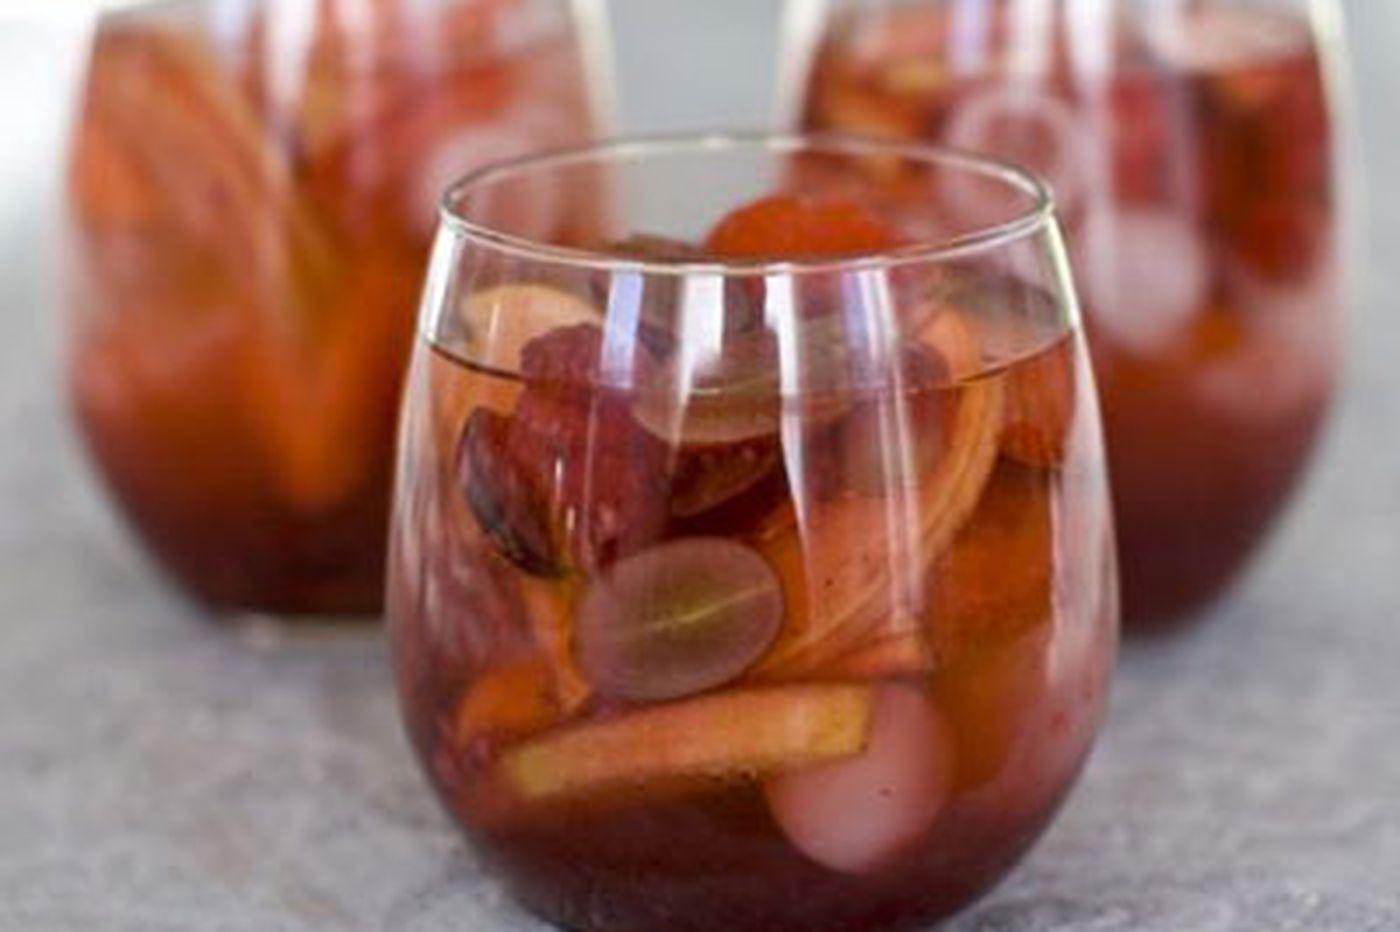 Chef's no-alcohol sangria is a festive, healthful choice